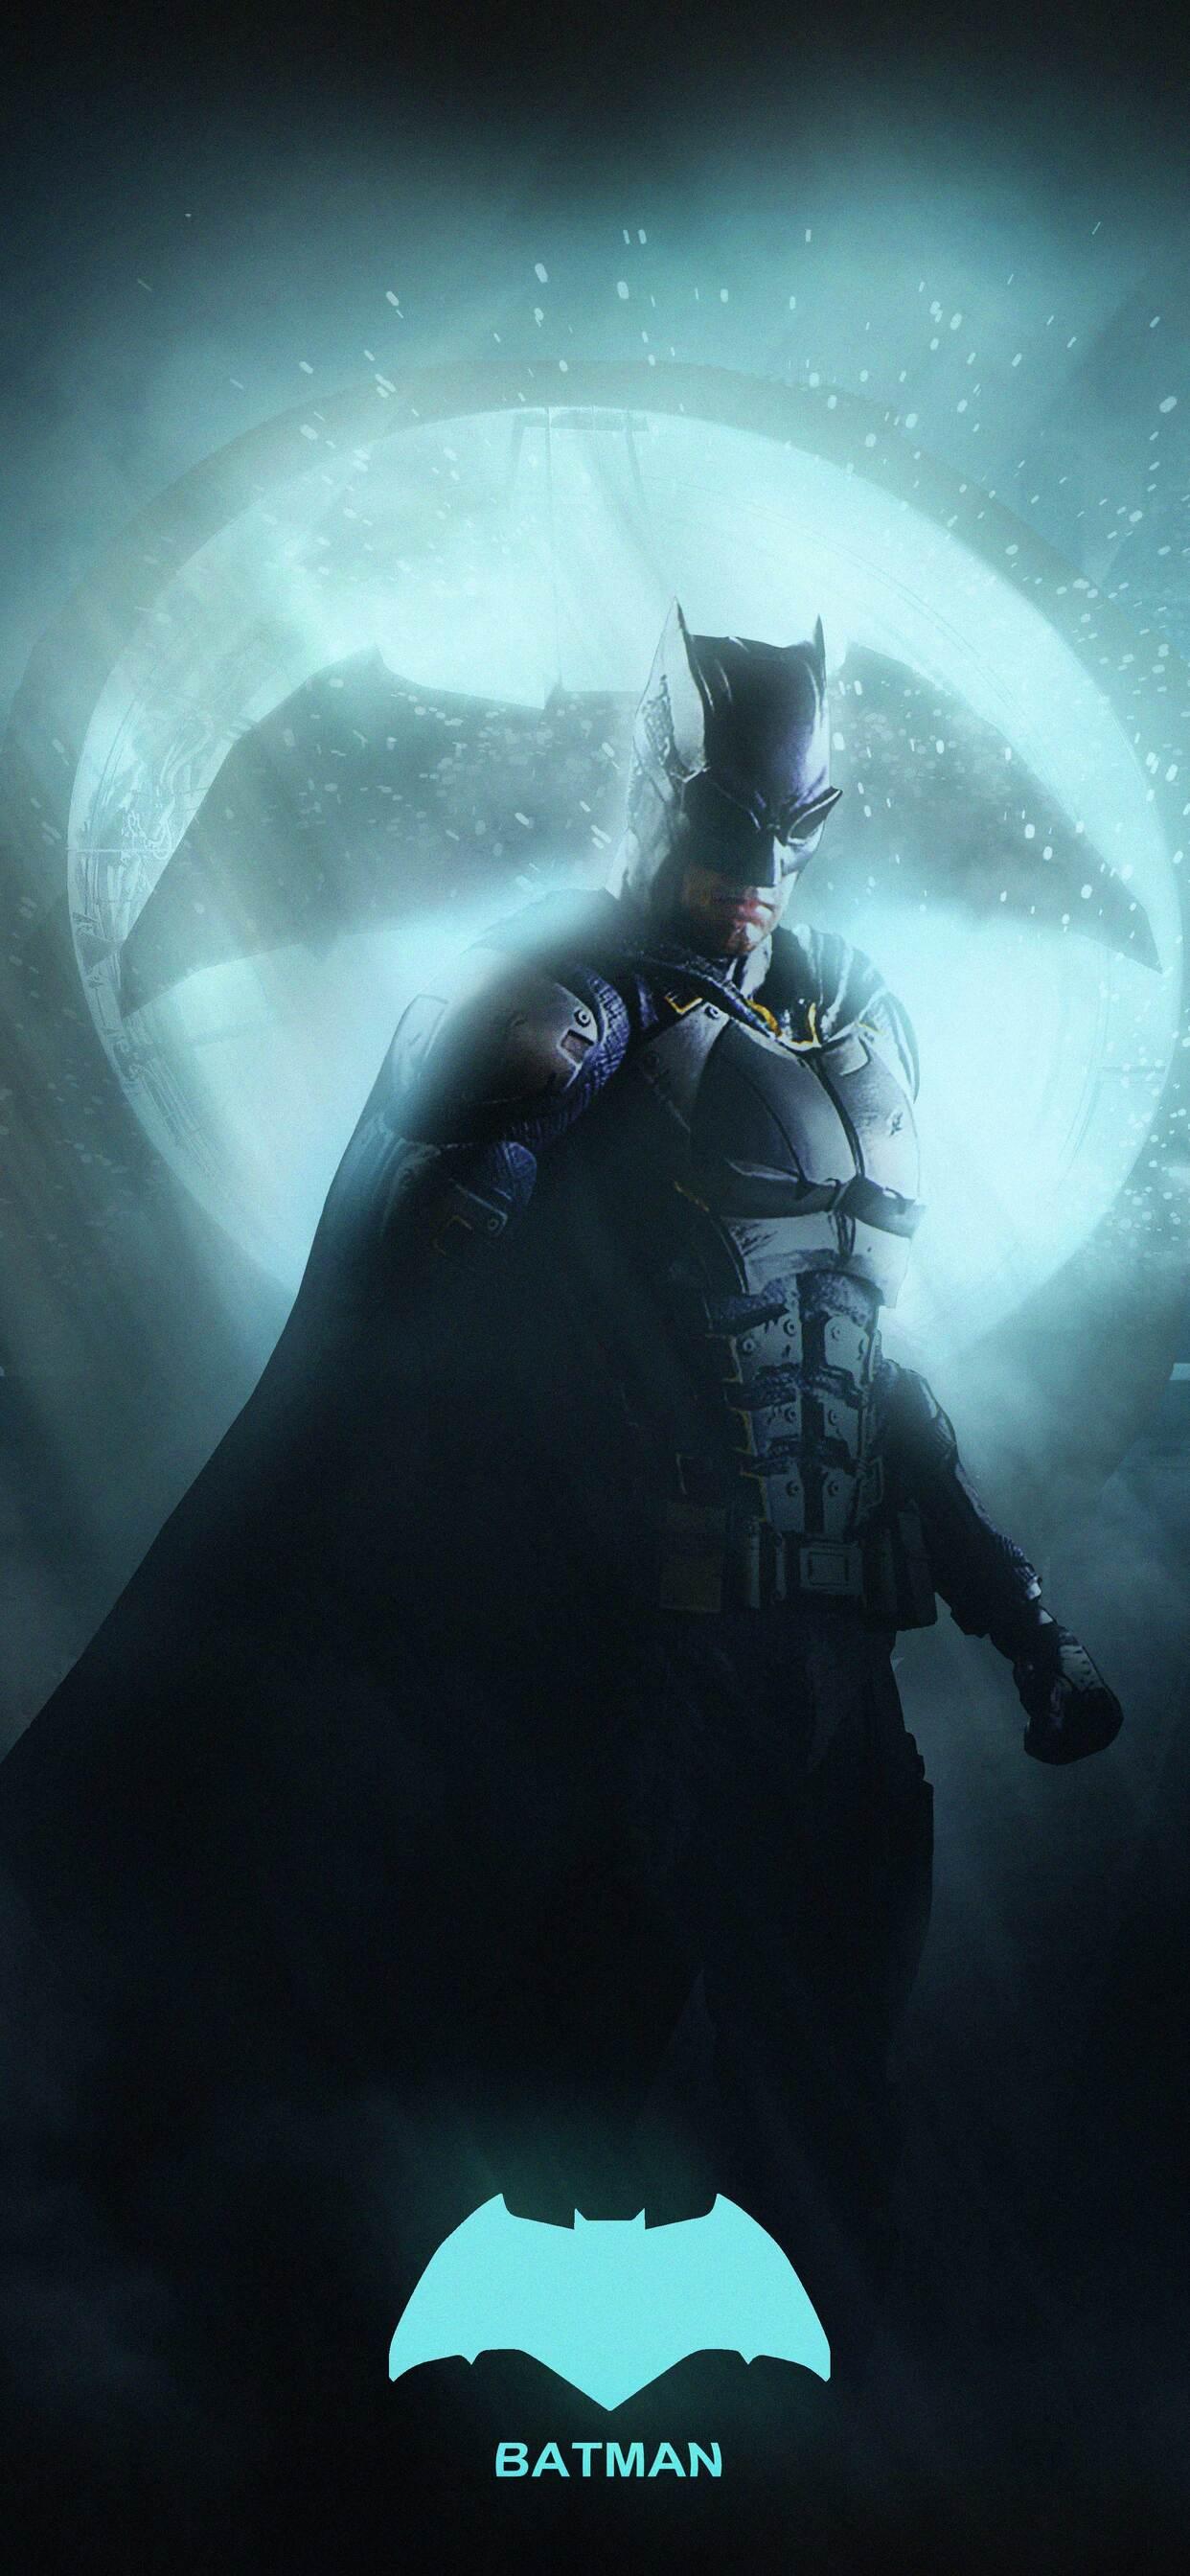 batman-justice-league-4k-art-e6.jpg